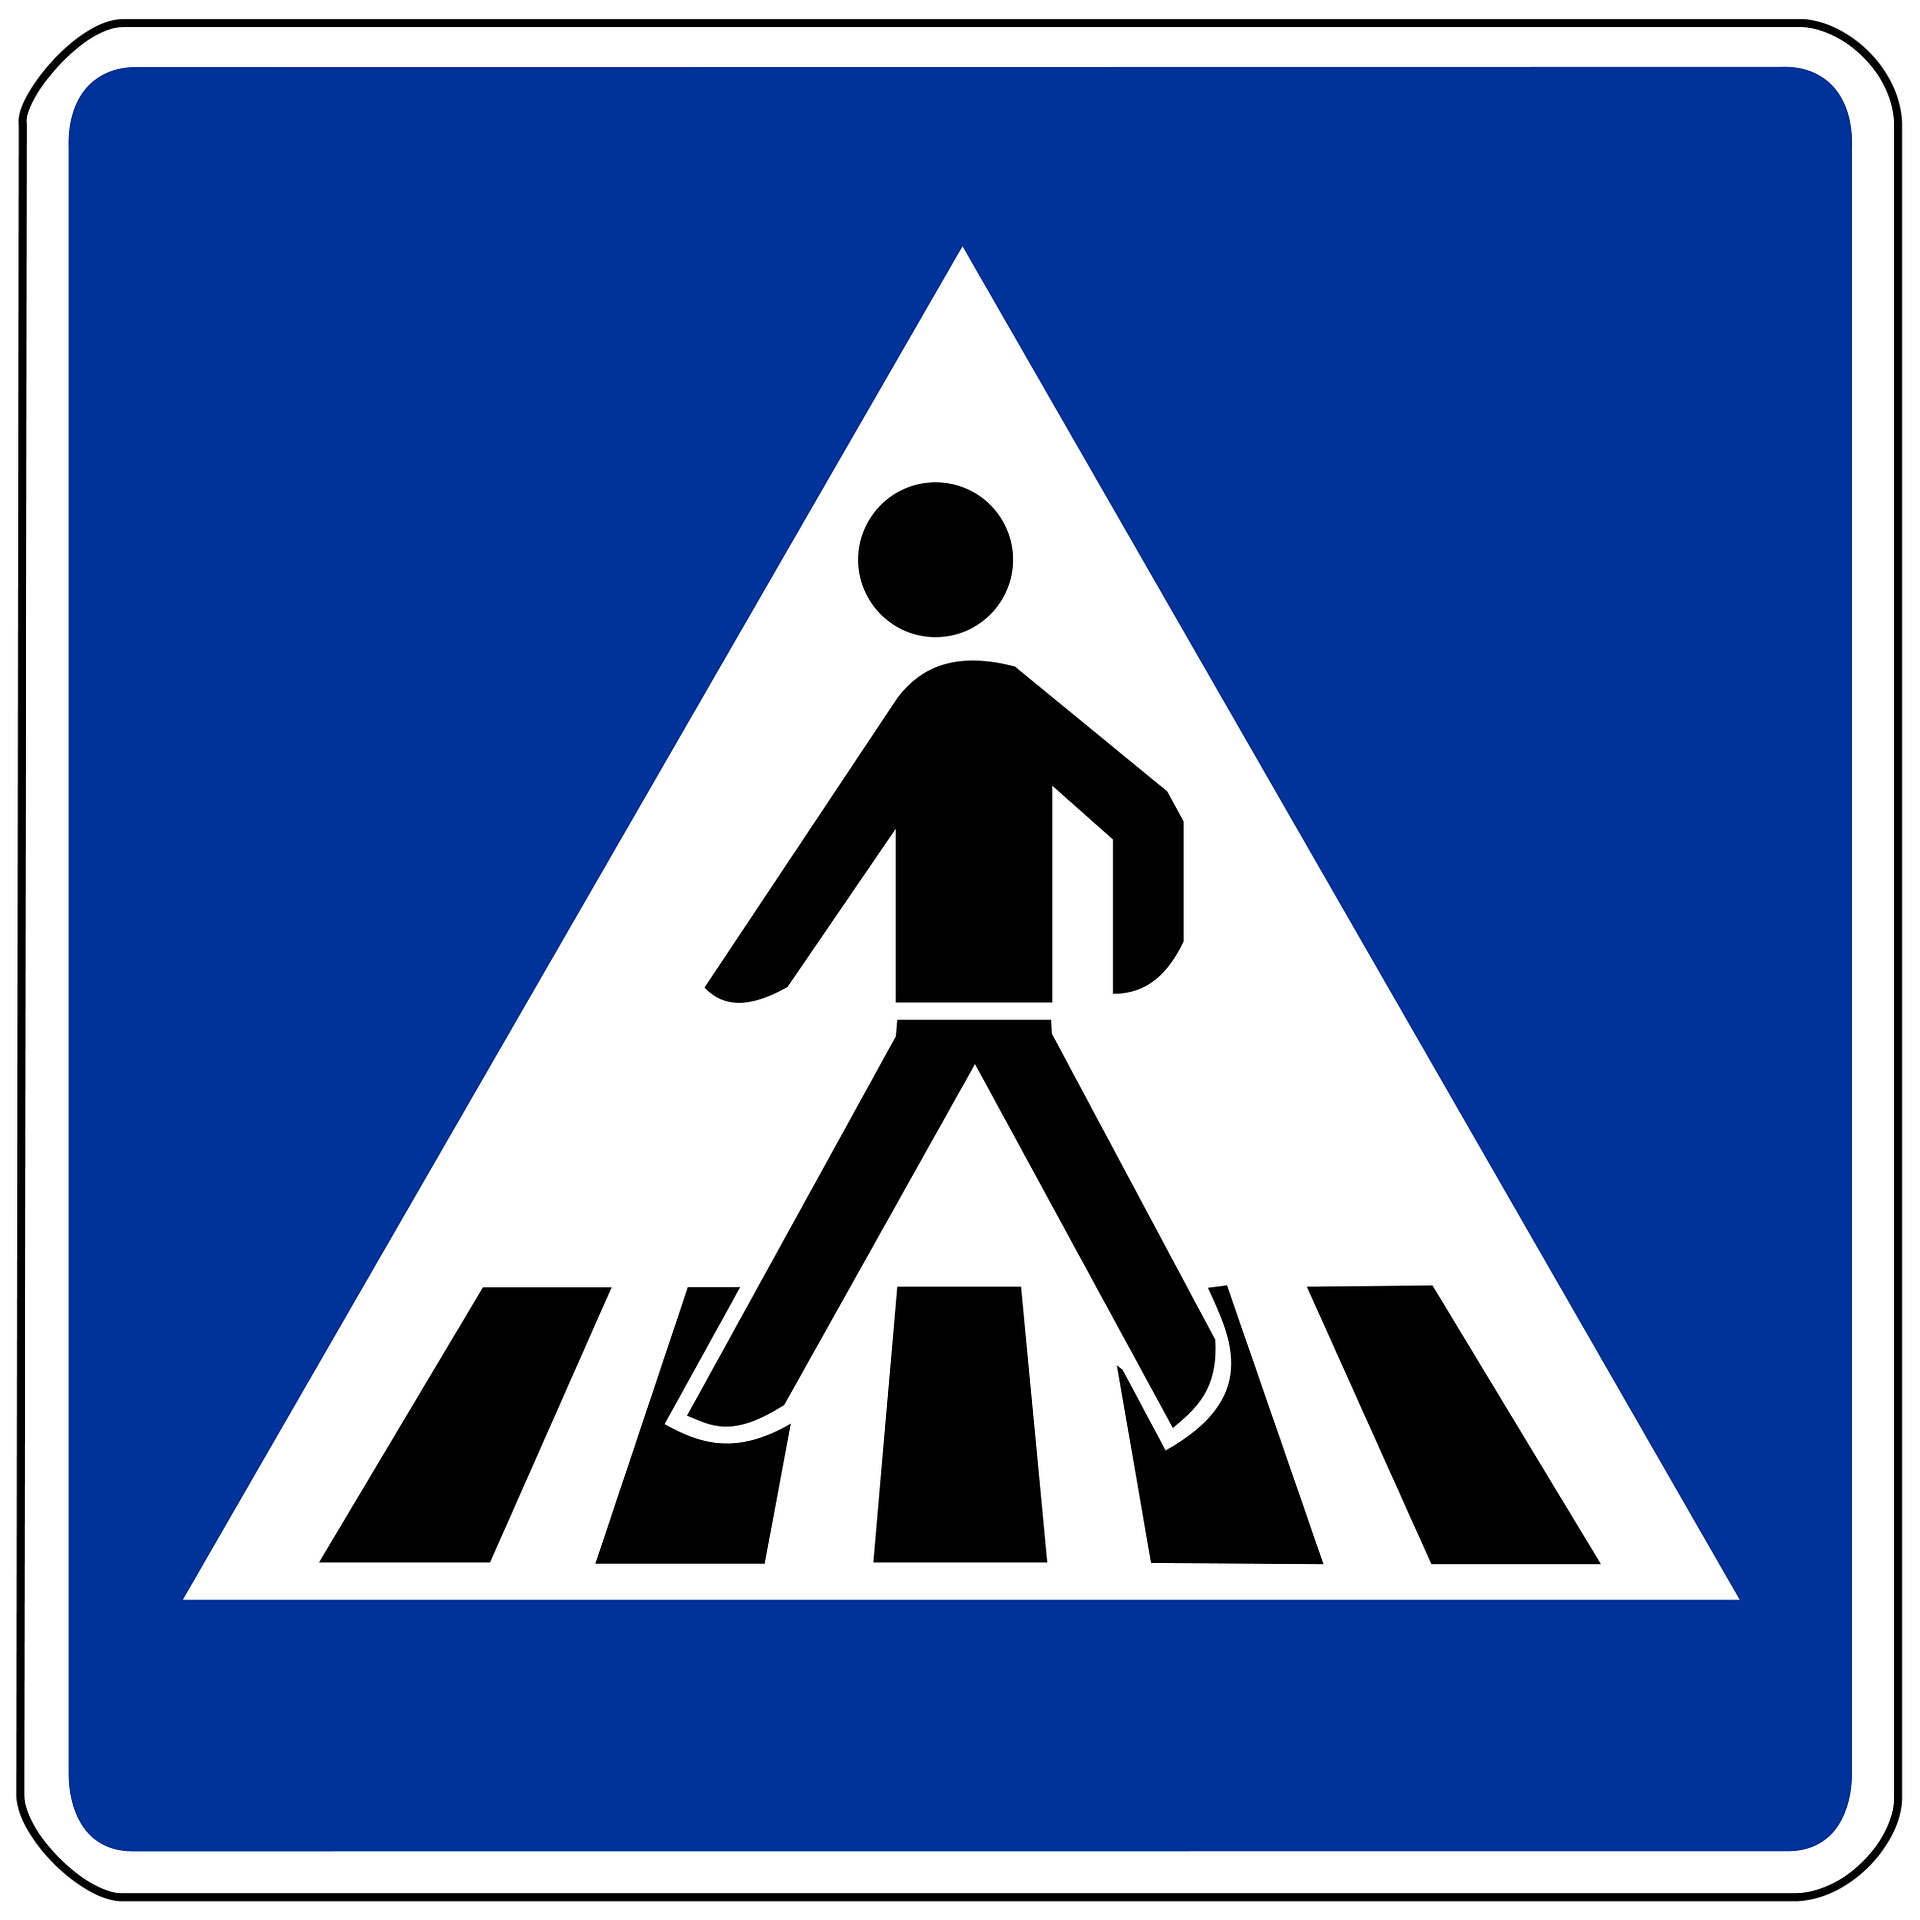 traffic-sign-6724_1920 (1)